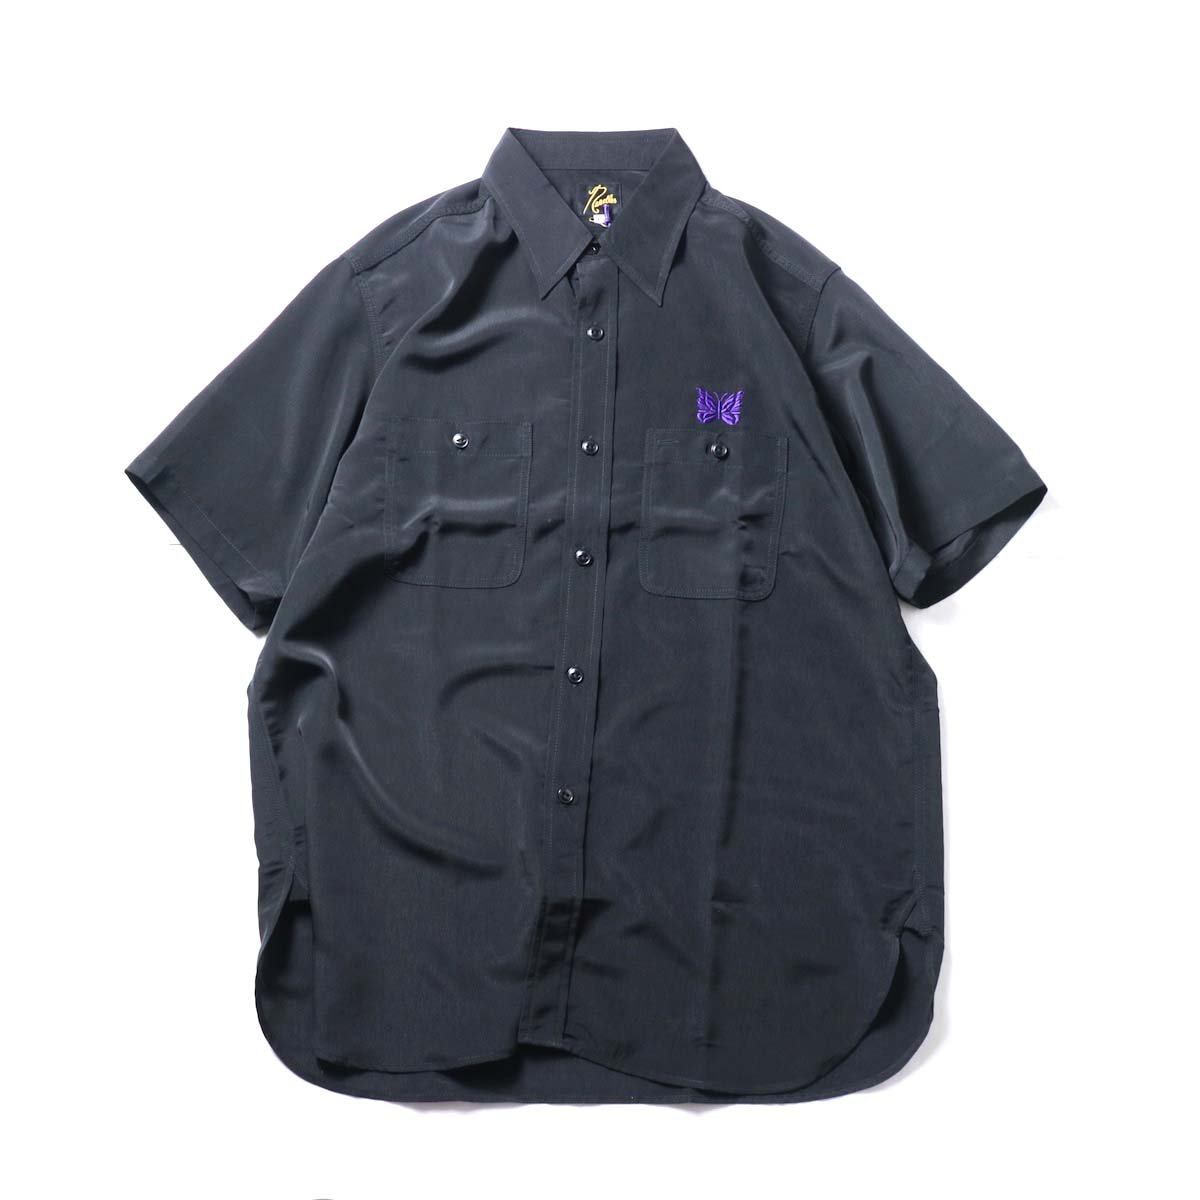 Needles / S/S Work Shirt - Poly Cloth (Black)